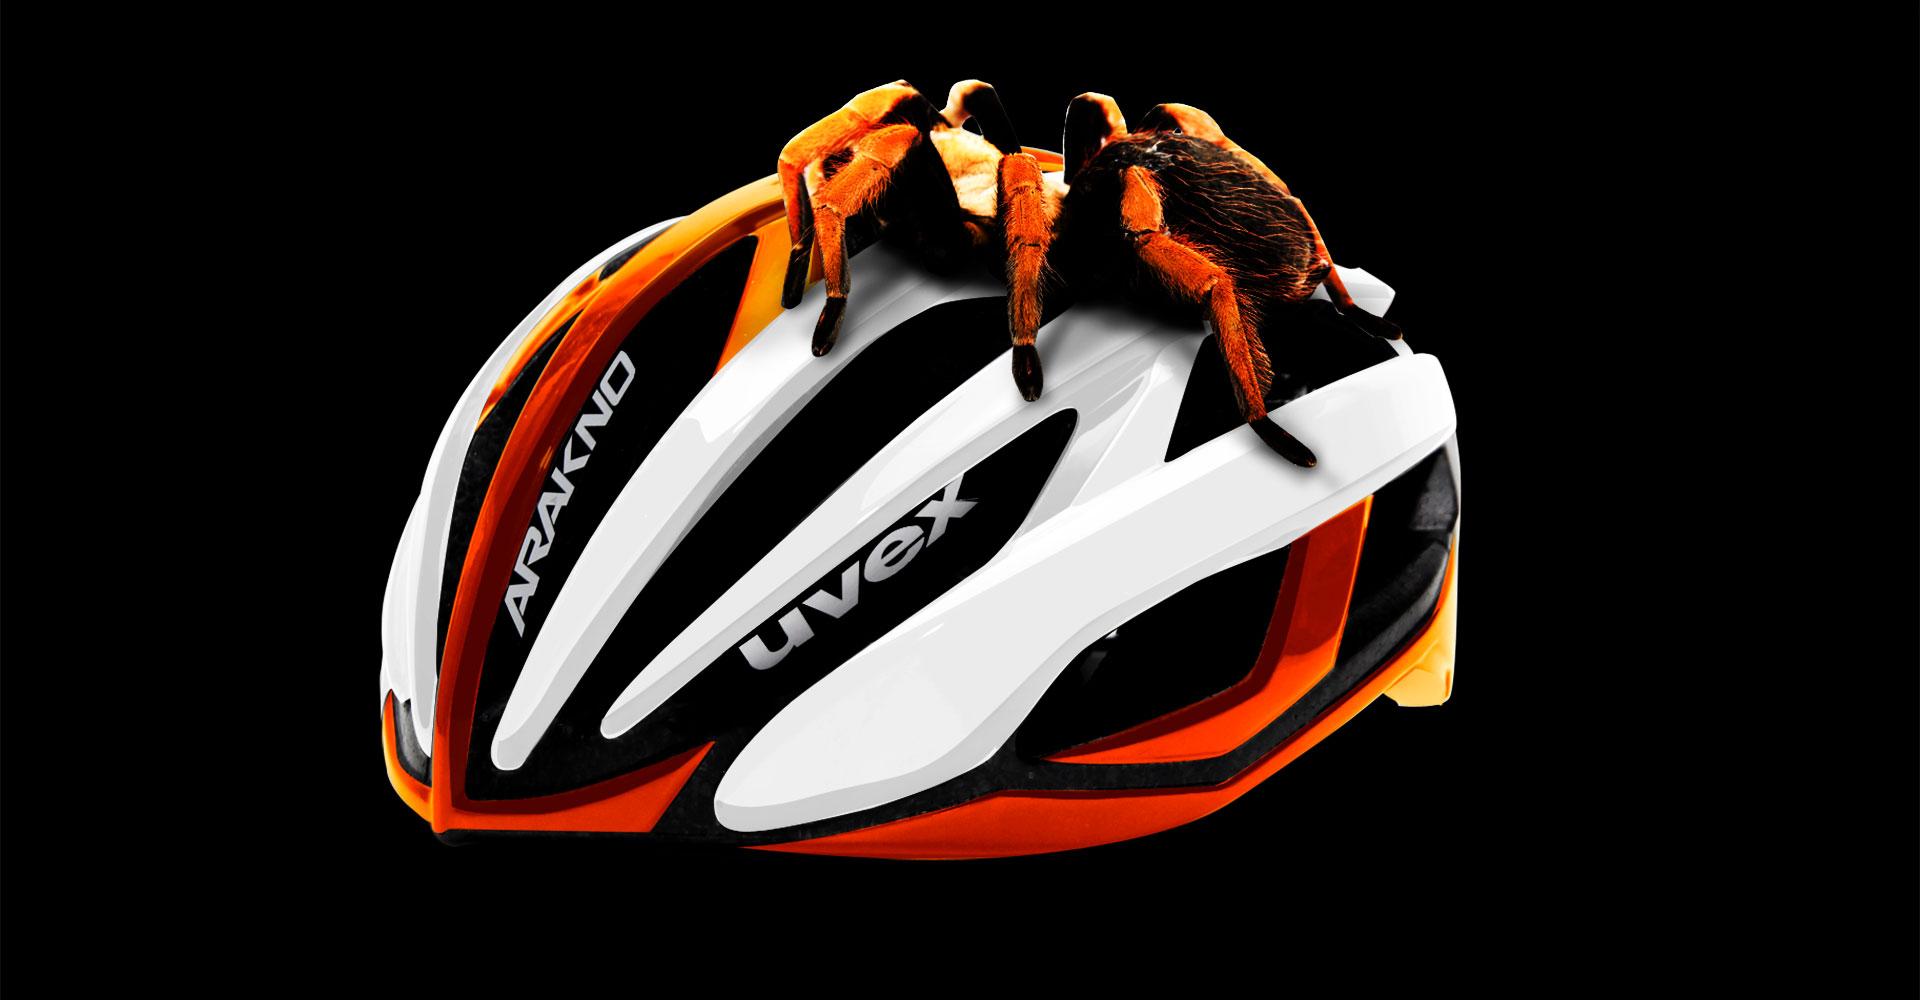 ARAKNO Helmets